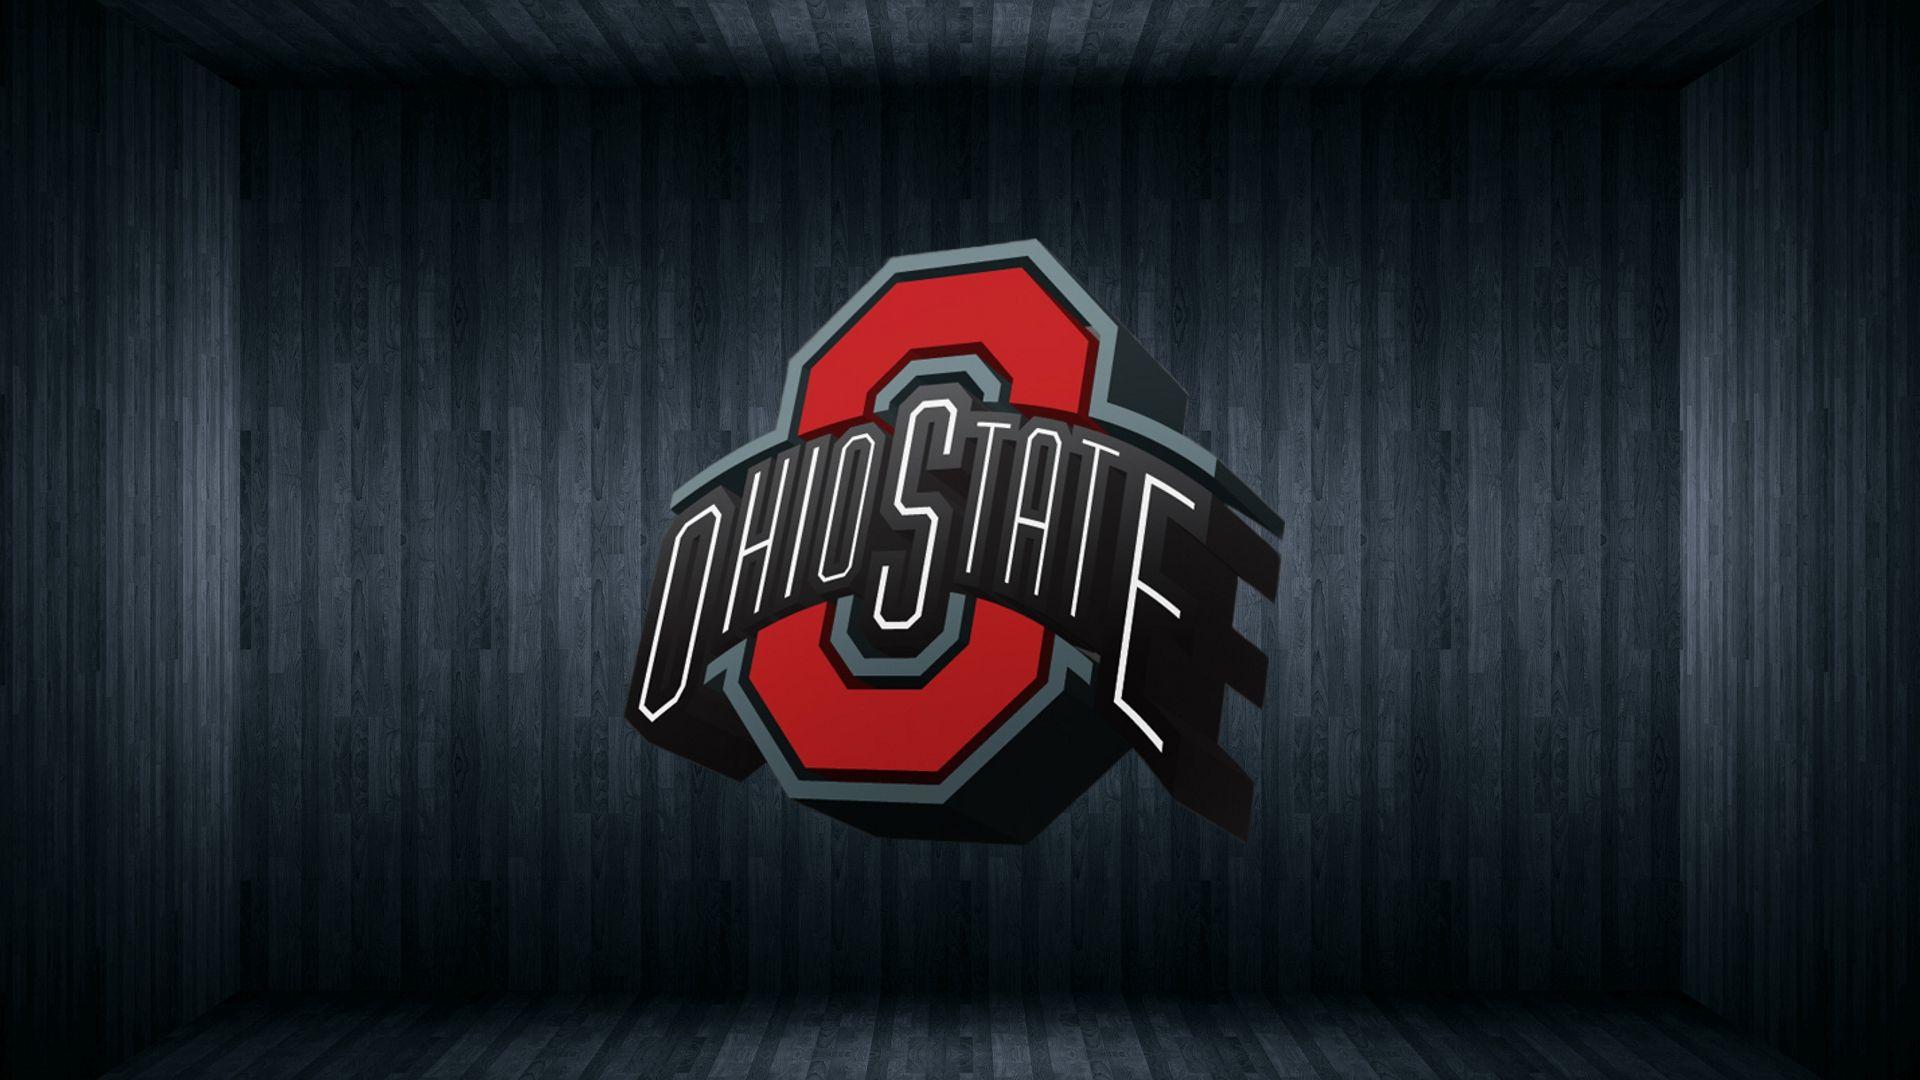 OSU Wallpaper 205 Ohio state, Ohio state university